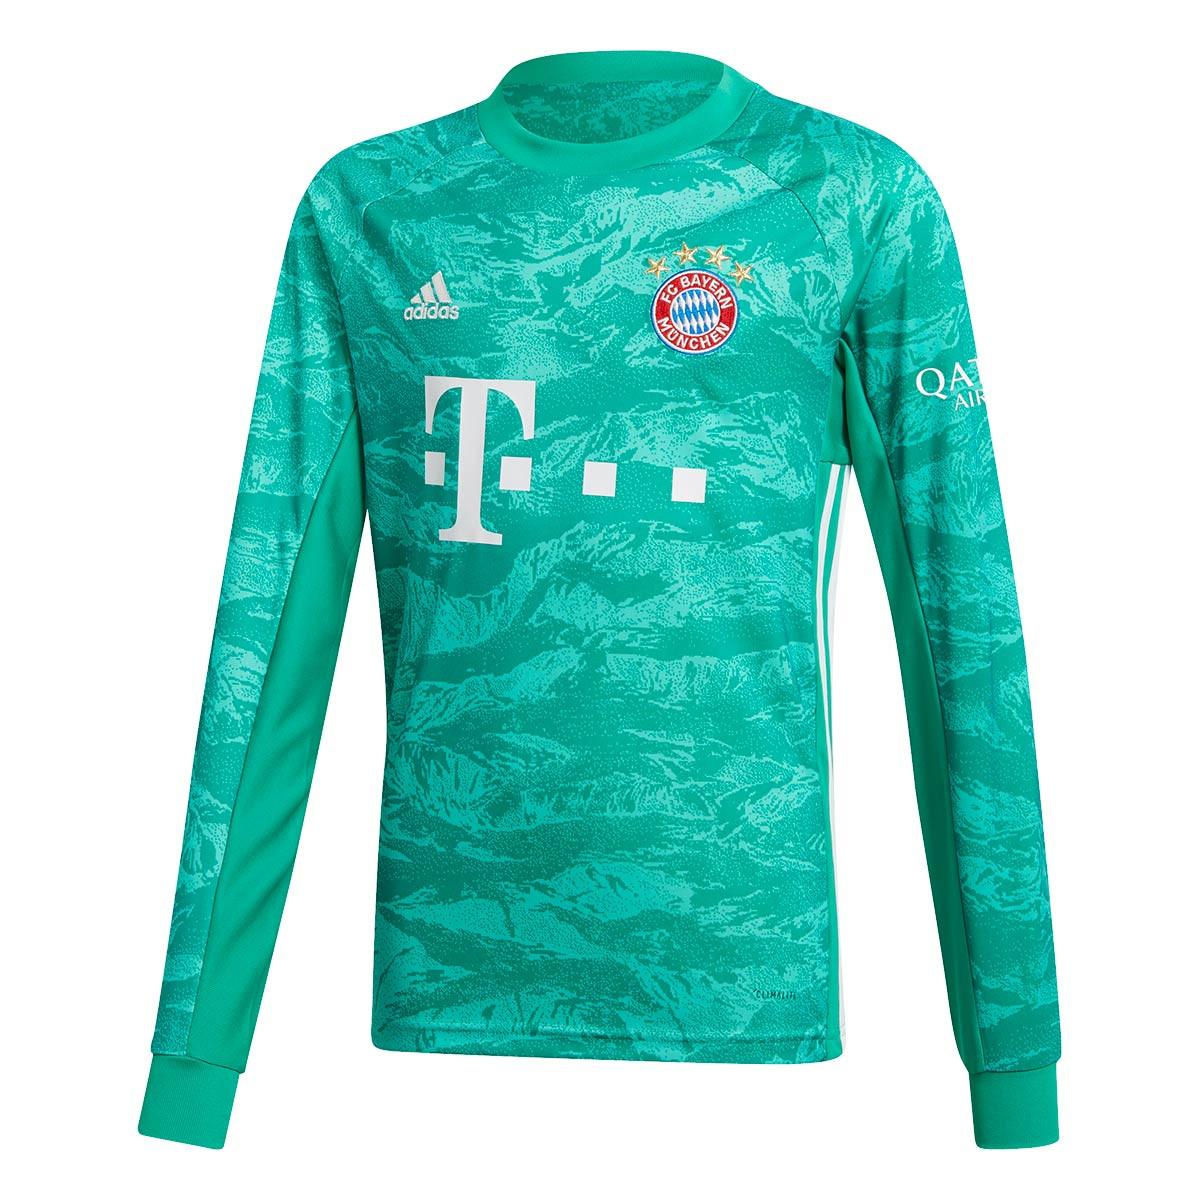 super popular 65159 f9790 Camiseta Bayern Munich Portero Primera Equipación 2019-2020 Niño Core green